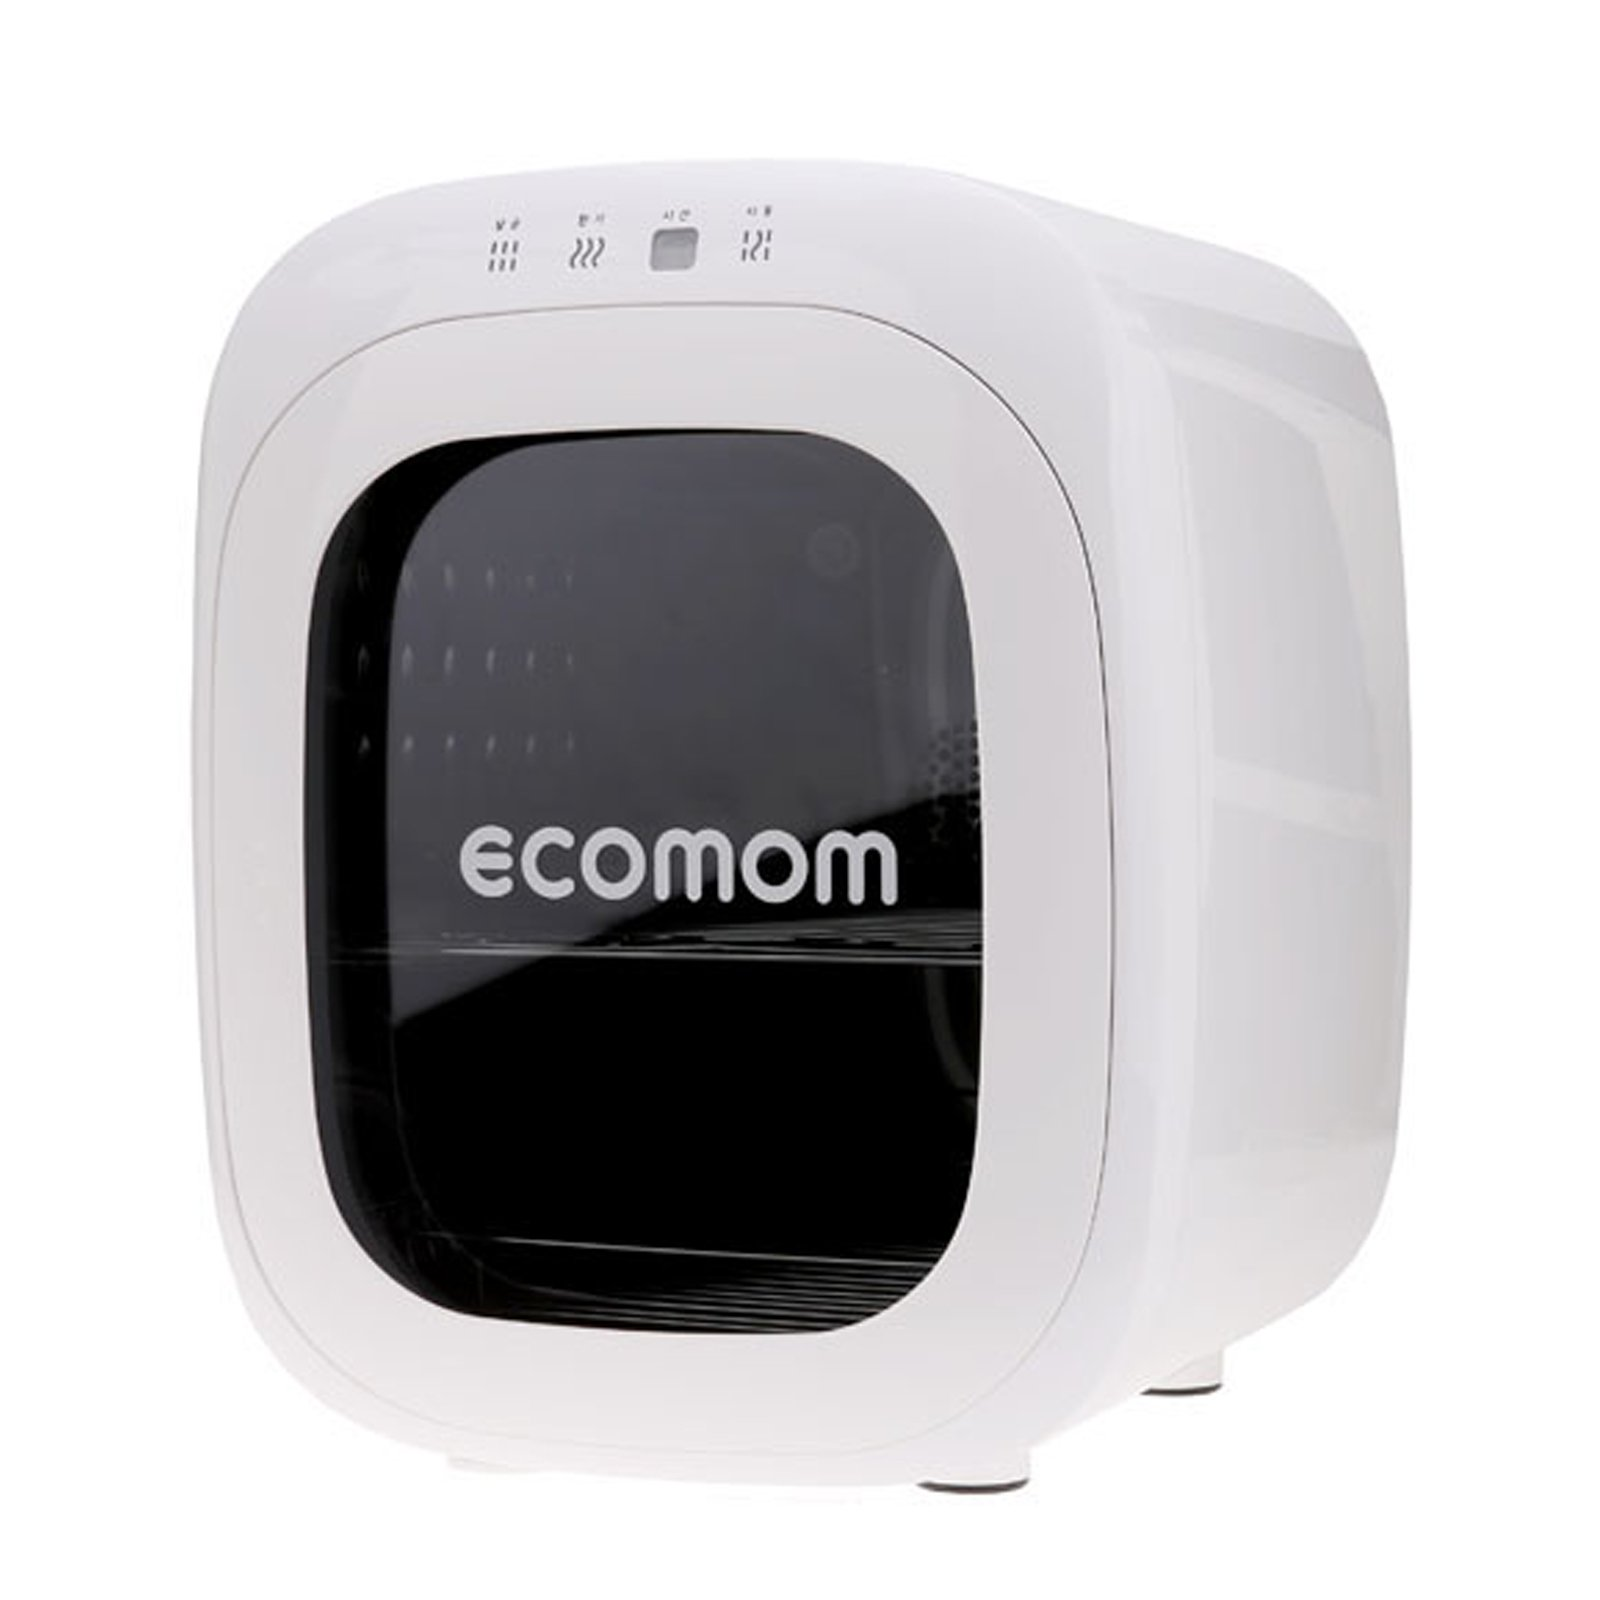 ECOMOM ECO-33 Baby Bottle Multi Sterilizer Ultraviolet Disinfection 220V (White)